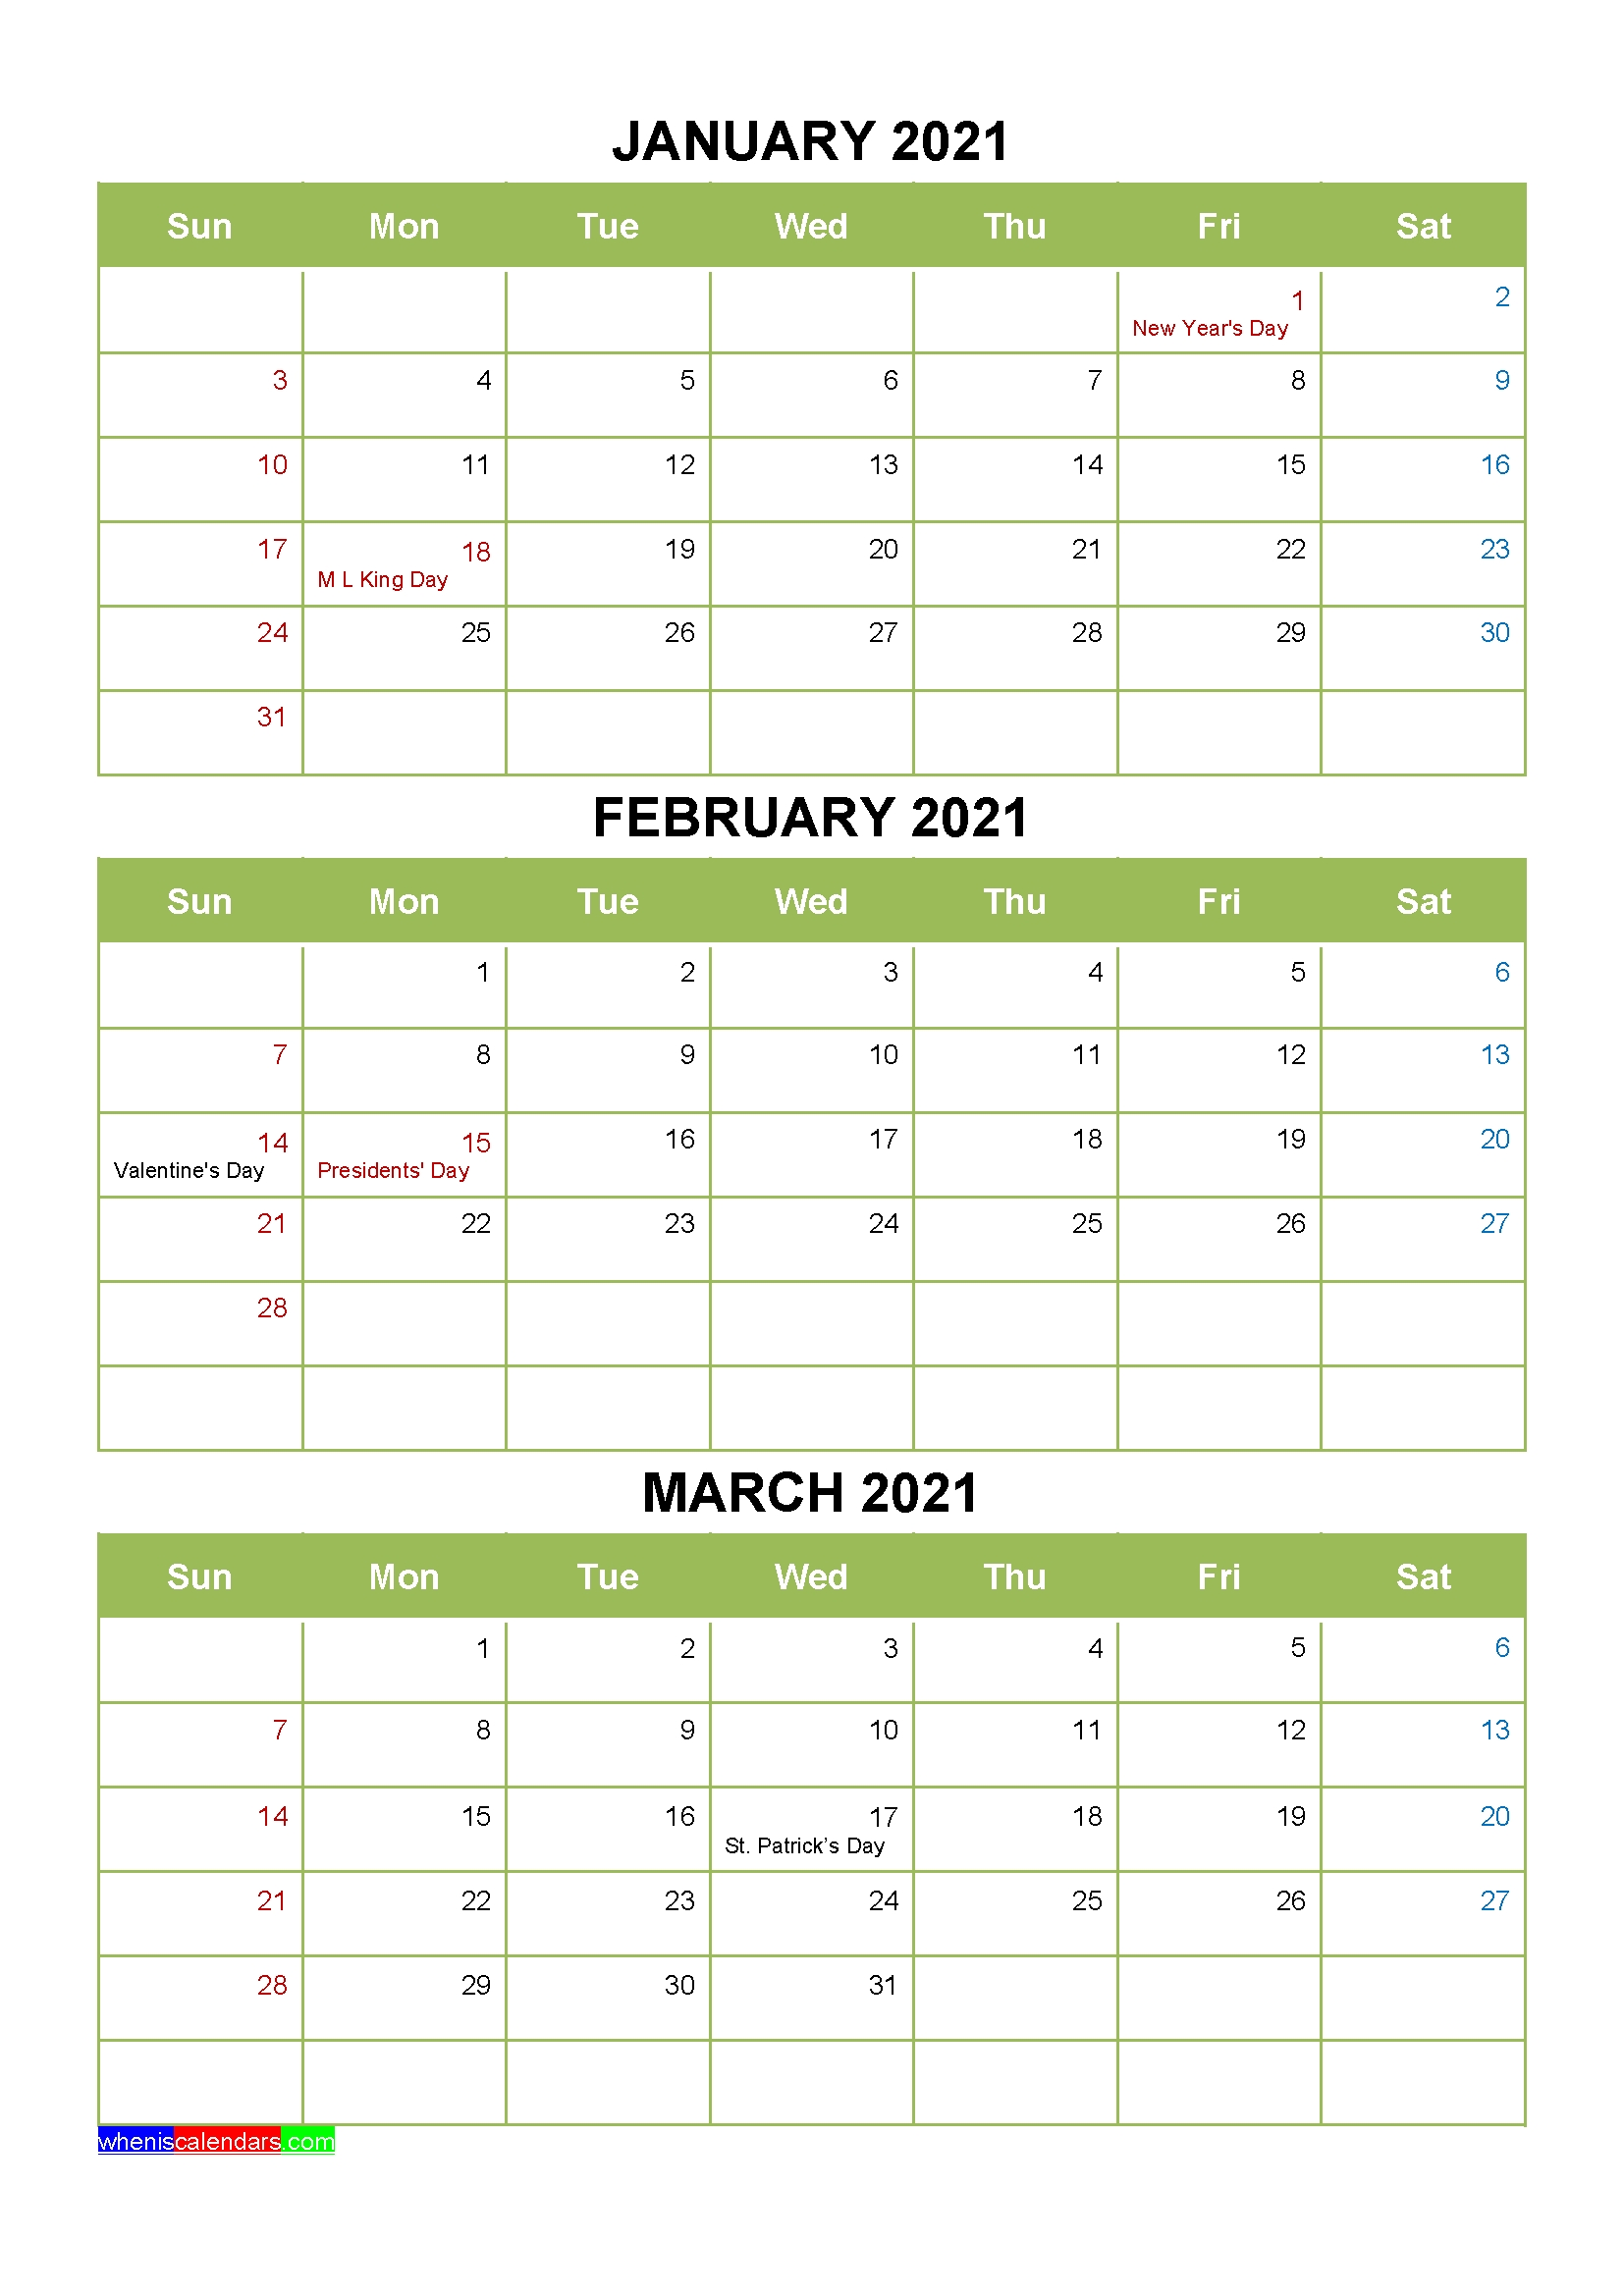 Free Printable January February March 2021 Calendar 3